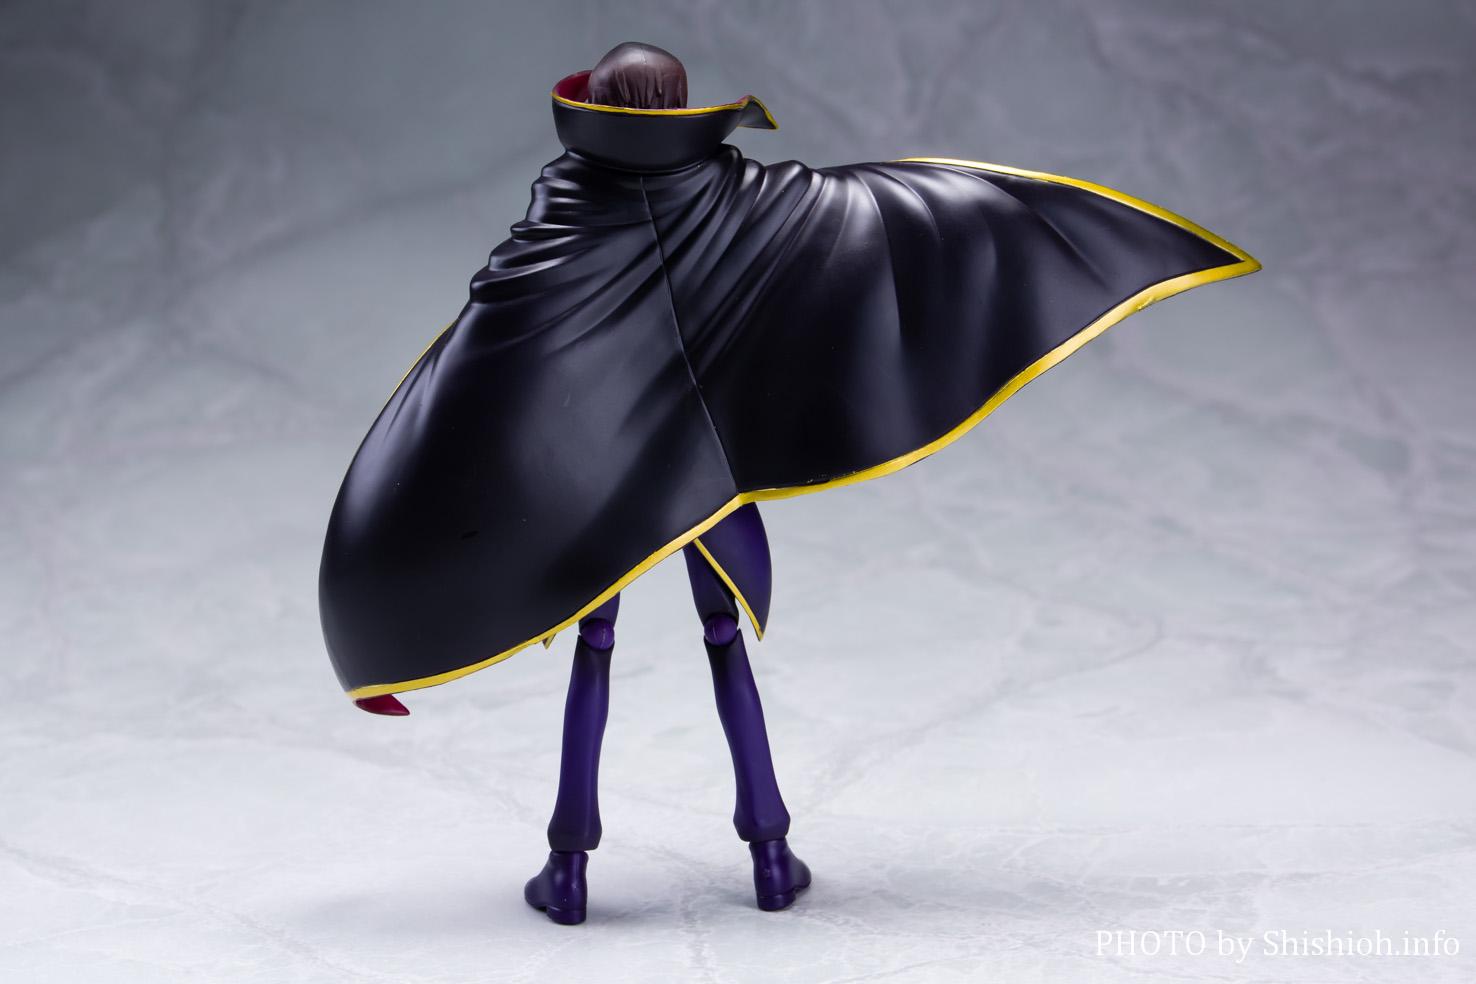 S.H.Figuarts ルルーシュ・ランペルージ(ゼロ R2衣装)